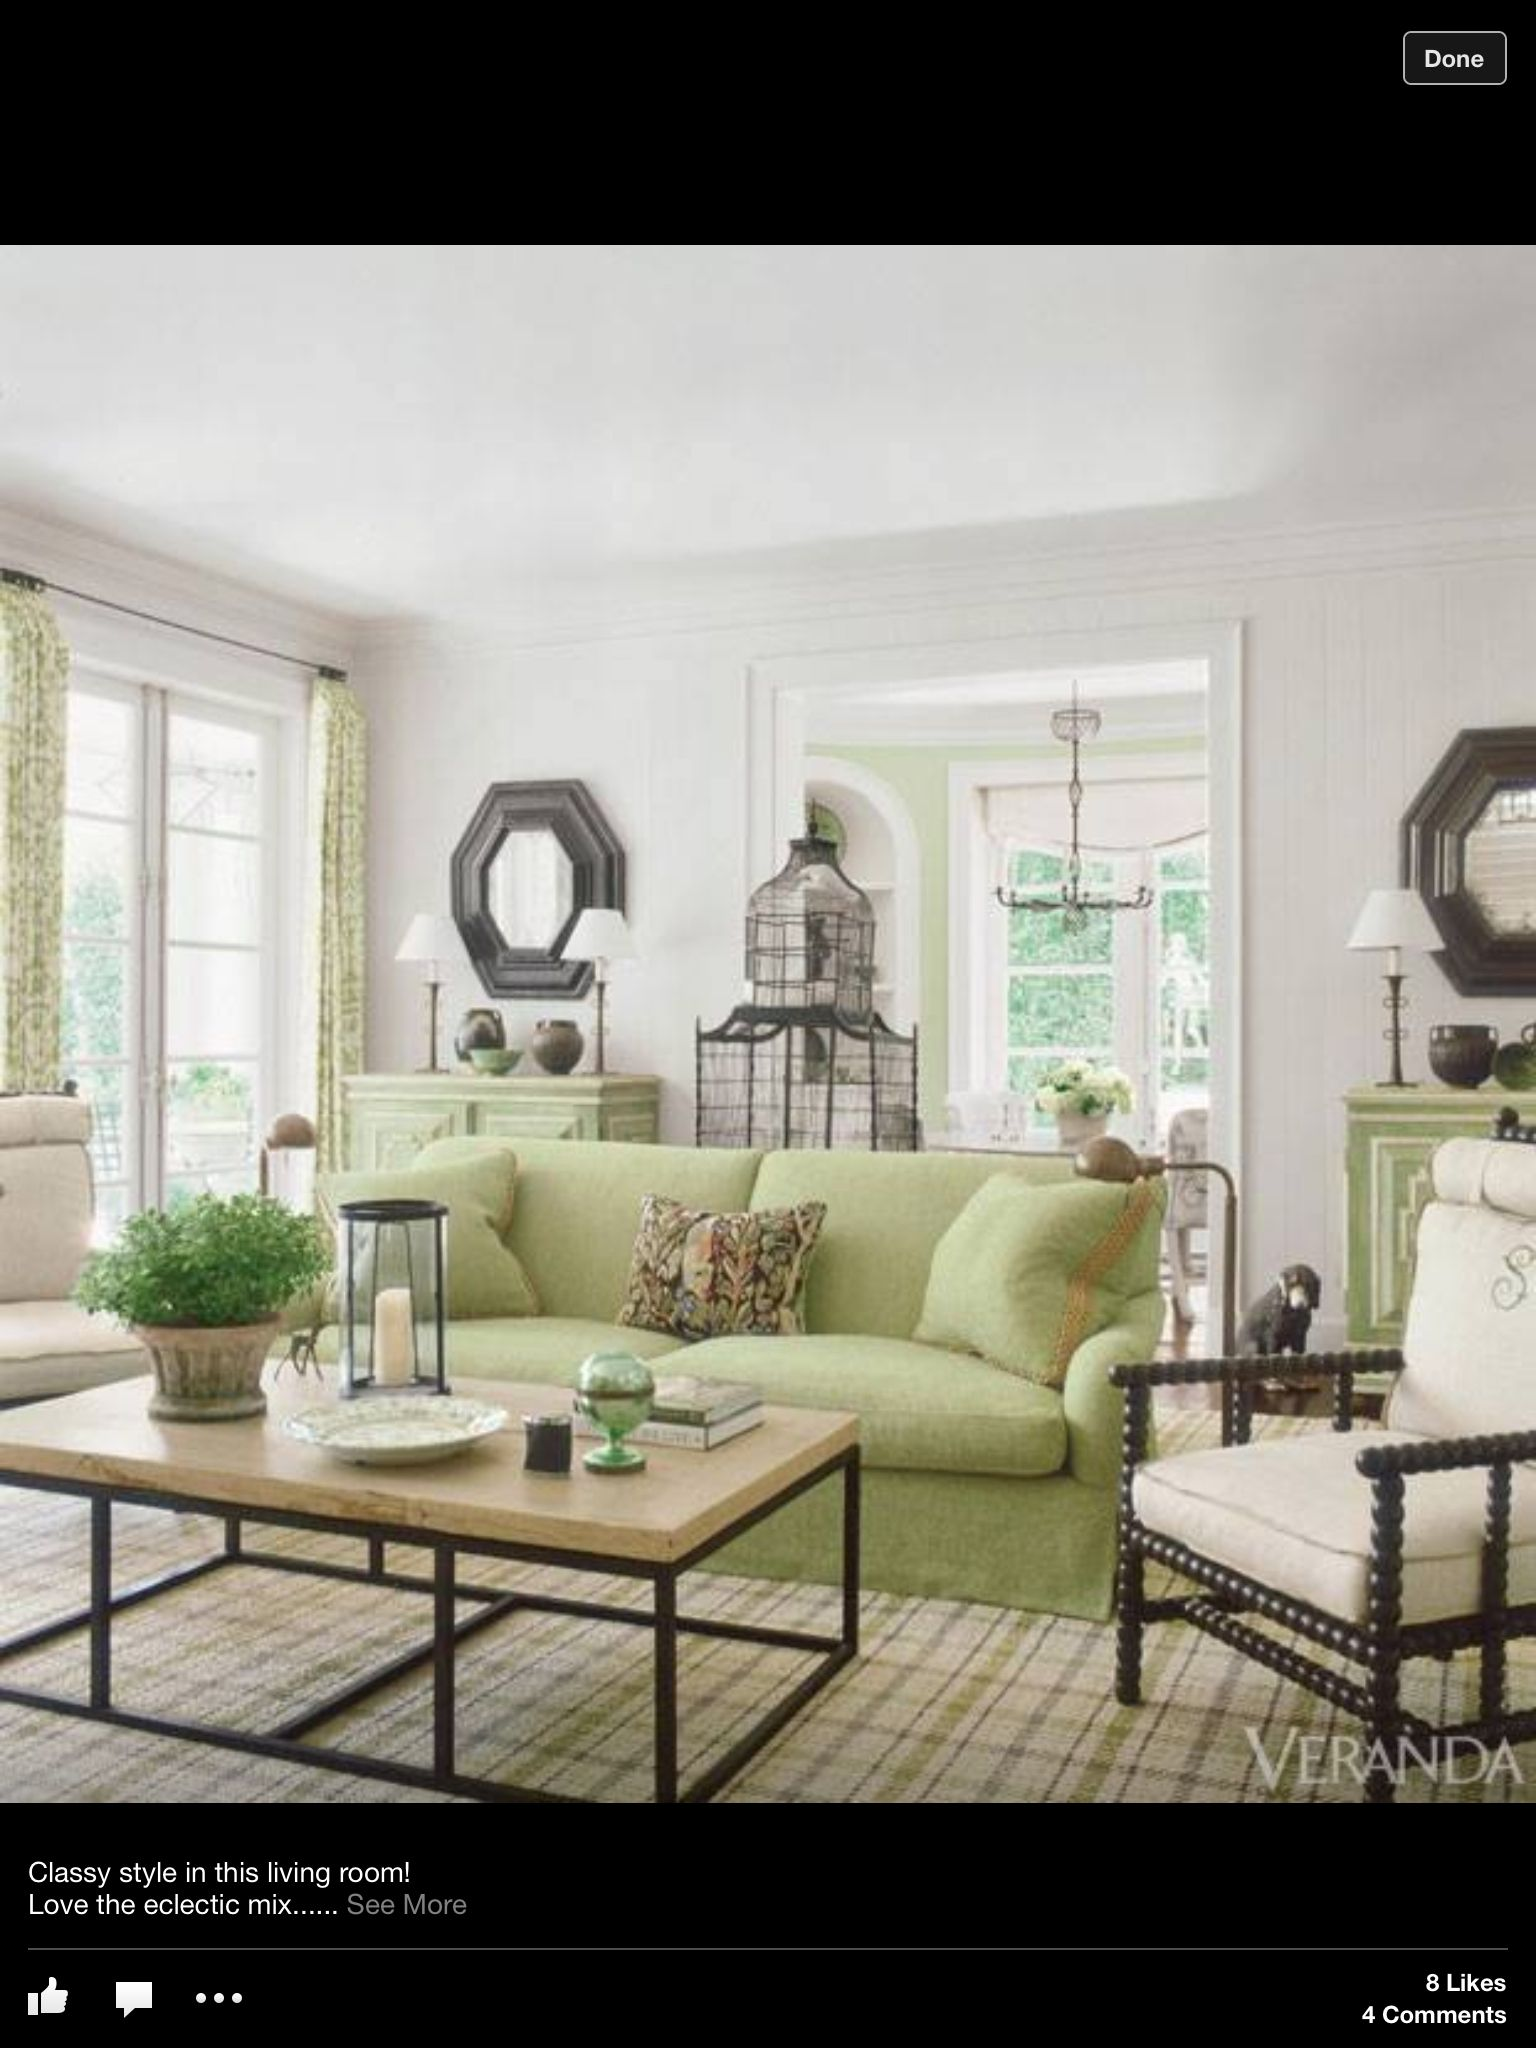 Pretty green | Home Decor 3 | Pinterest